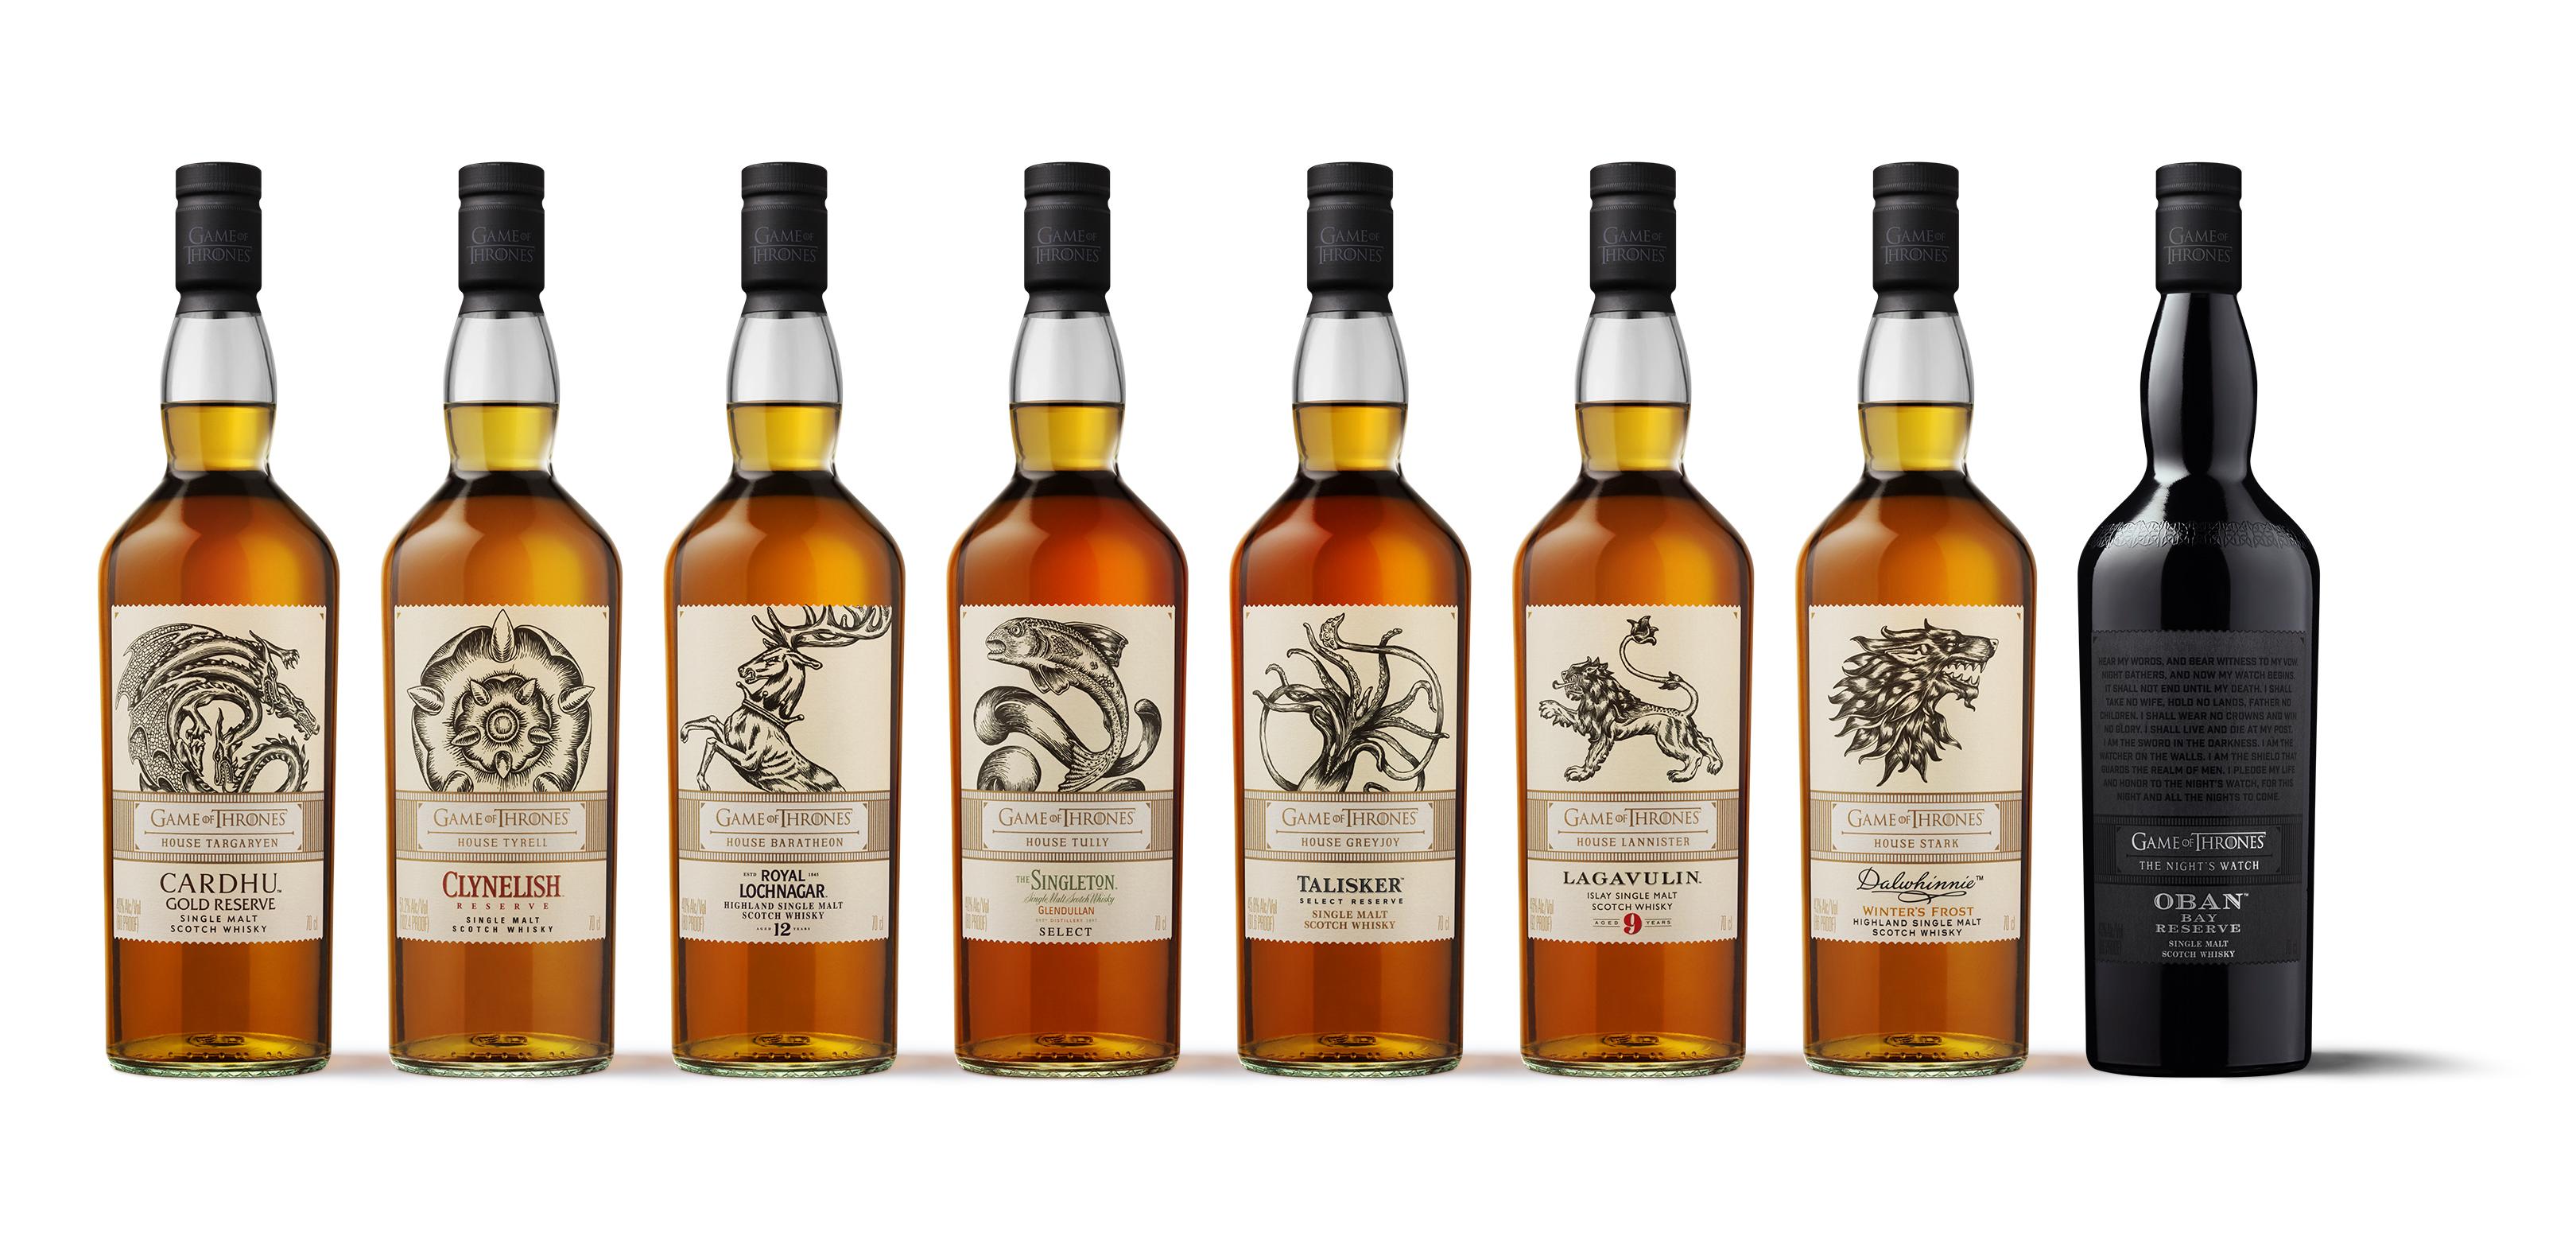 Whisky Im Bild Game Of Thrones Single Malt Scotch Whisky